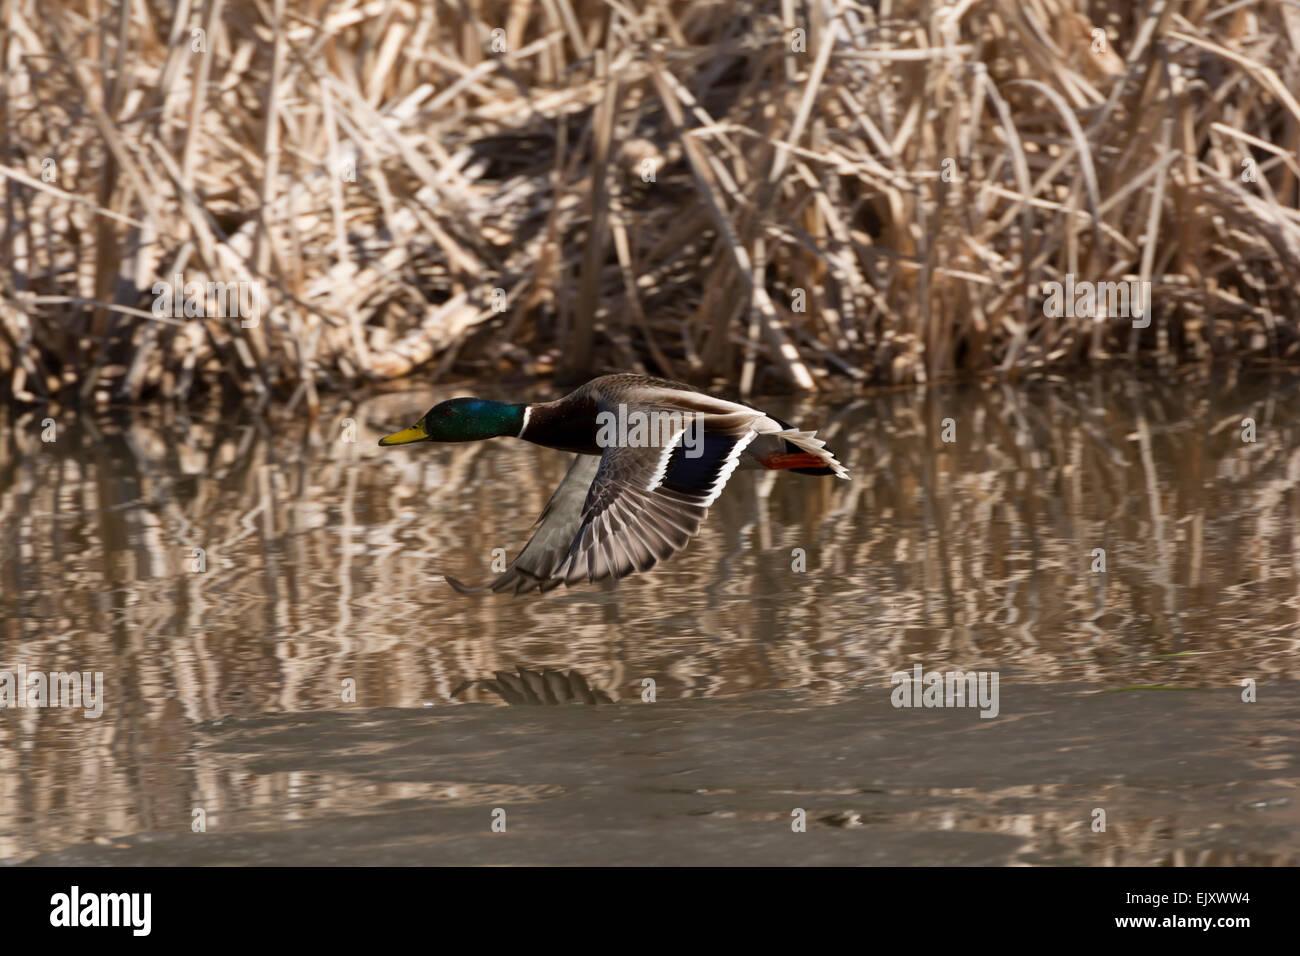 Mallard duck flying. - Stock Image